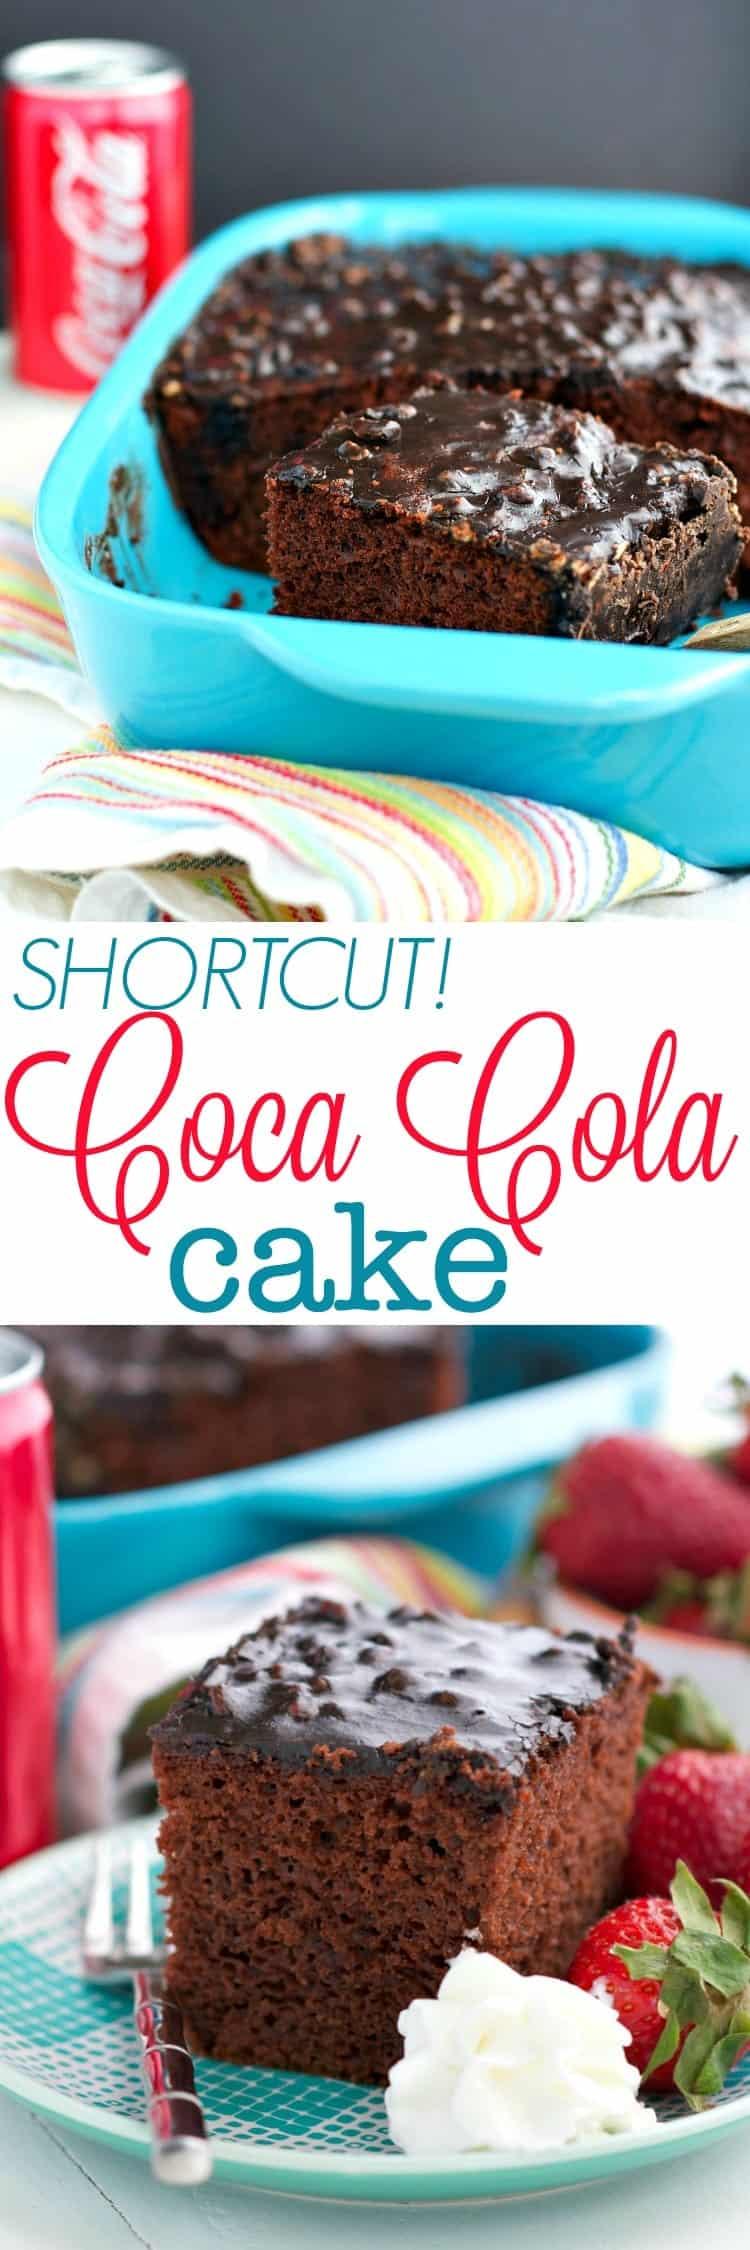 Coca Cola Cake Recipe With Box Mix